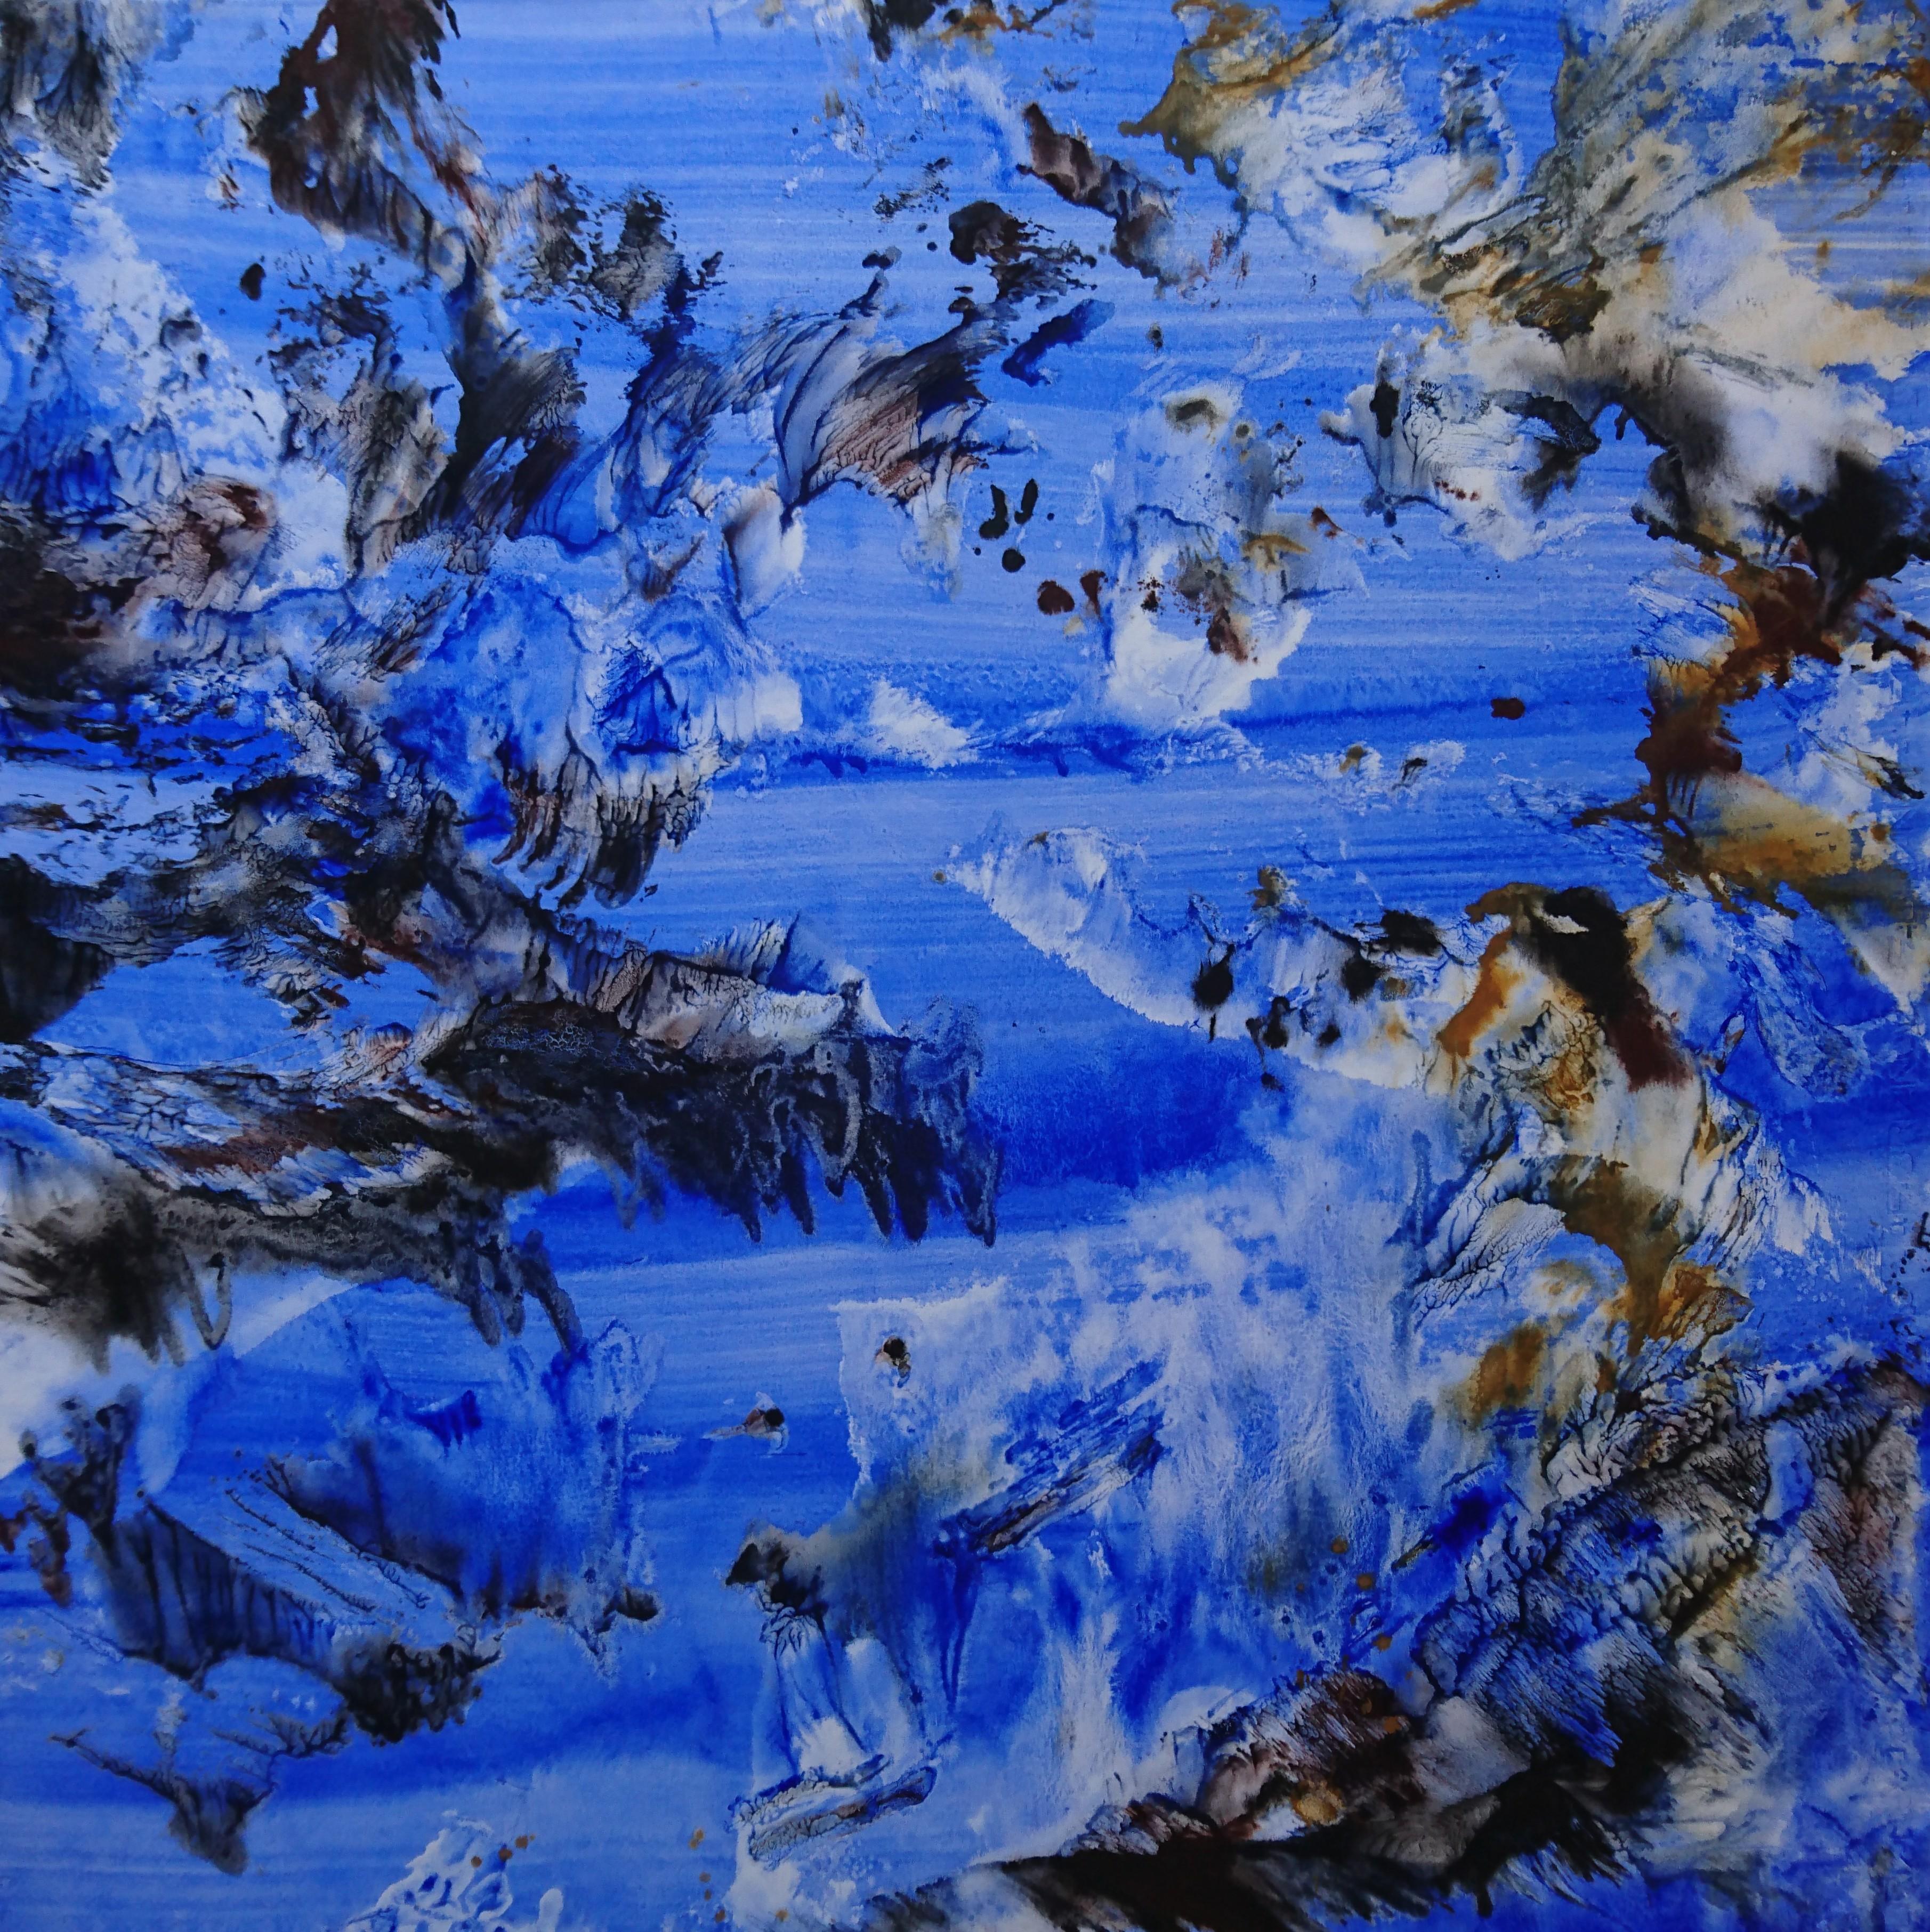 Yu Zhao, Mer ciel mouettes, tempera/paper/canvas, 75x75cm, 2018